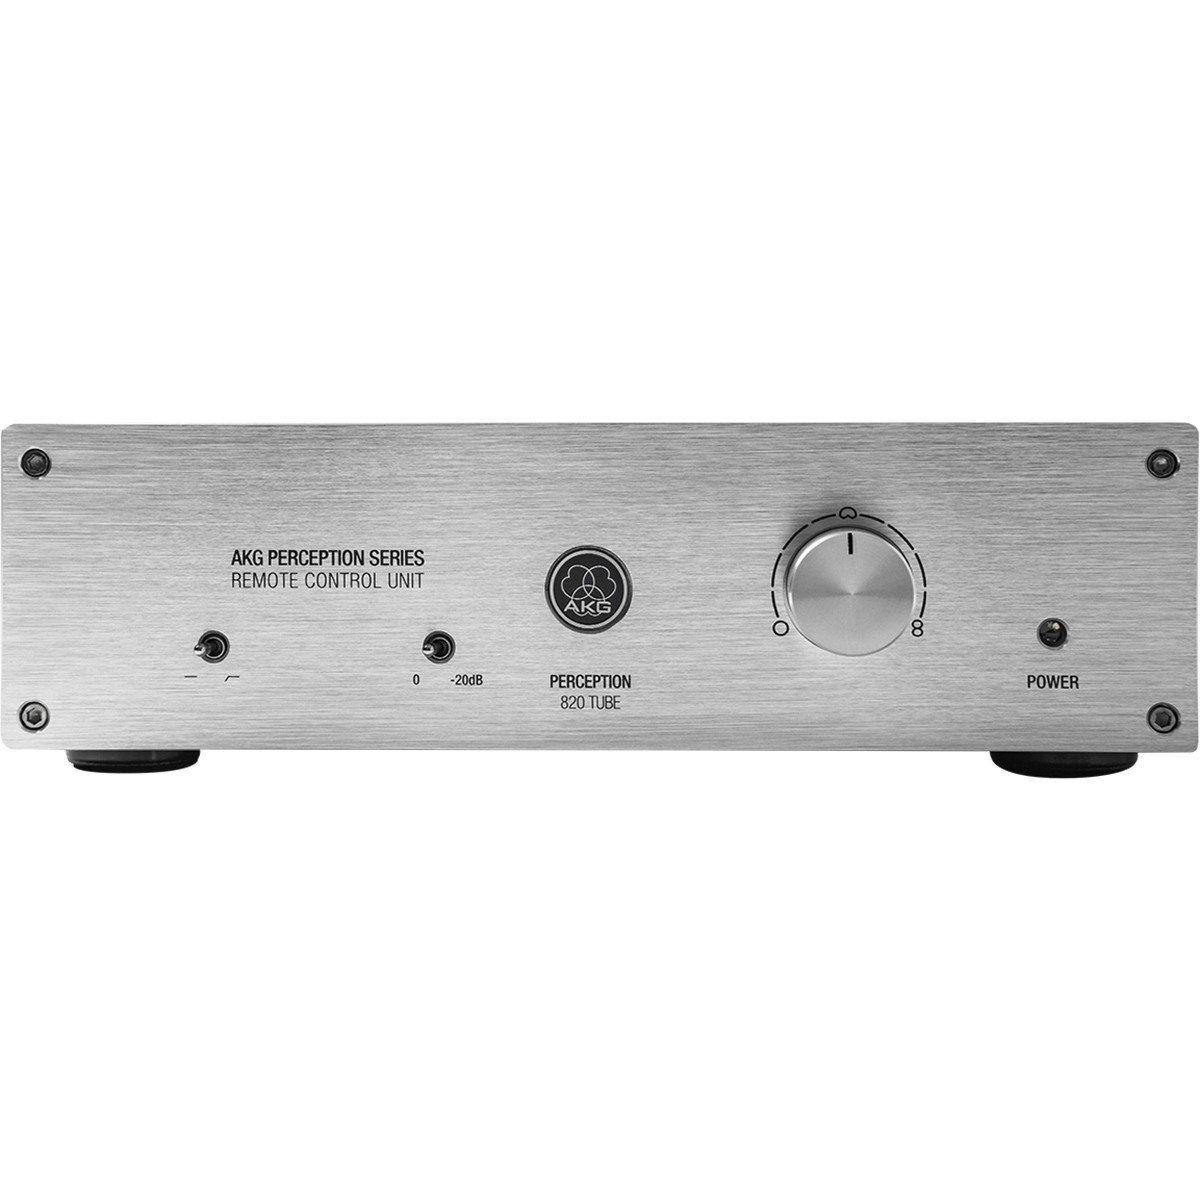 Akg Perception 820 Tube Microfone Condensador Akg Perception-820 para Estúdio Profissional